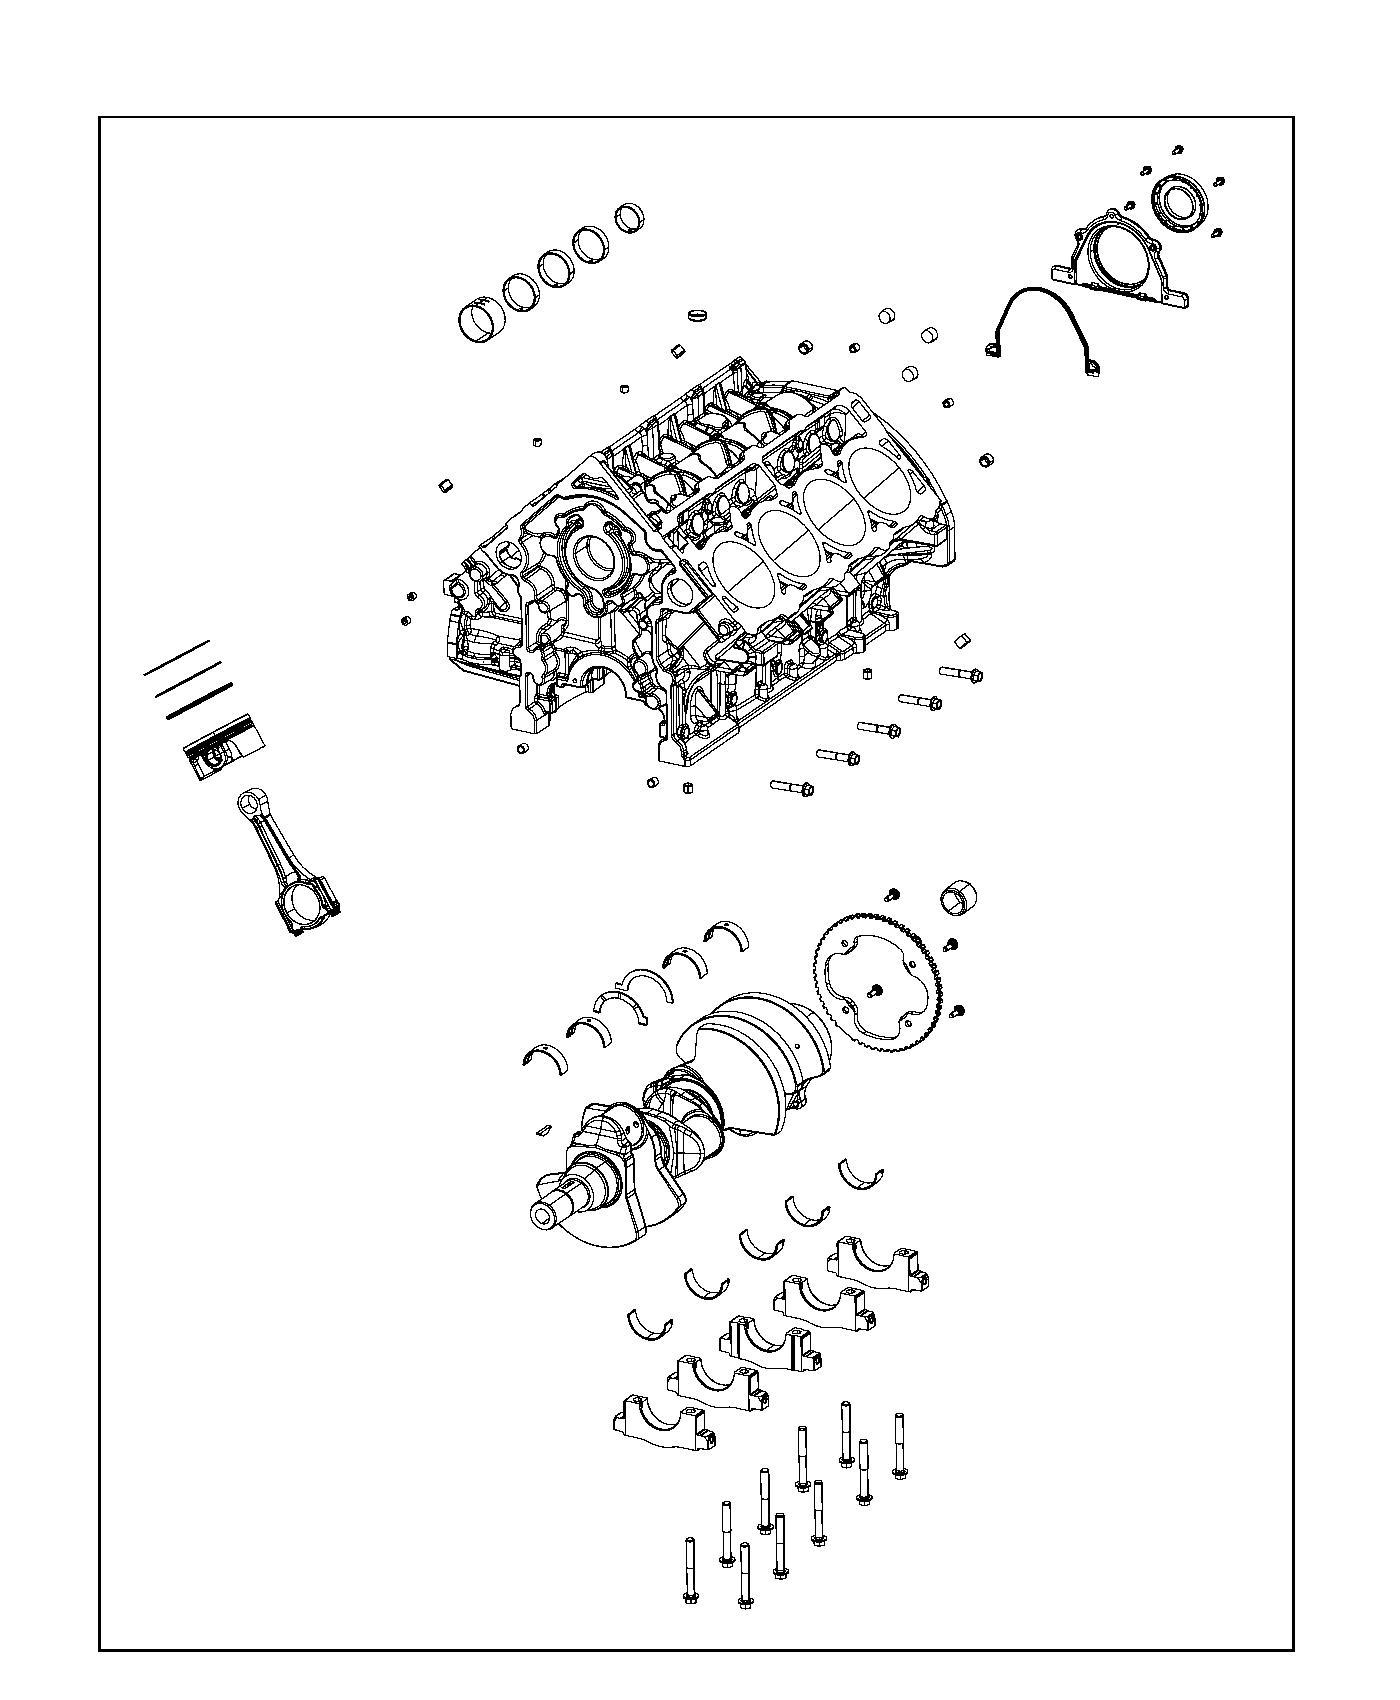 Dodge Durango Crankshaft. Crew cab. Damper, bearings